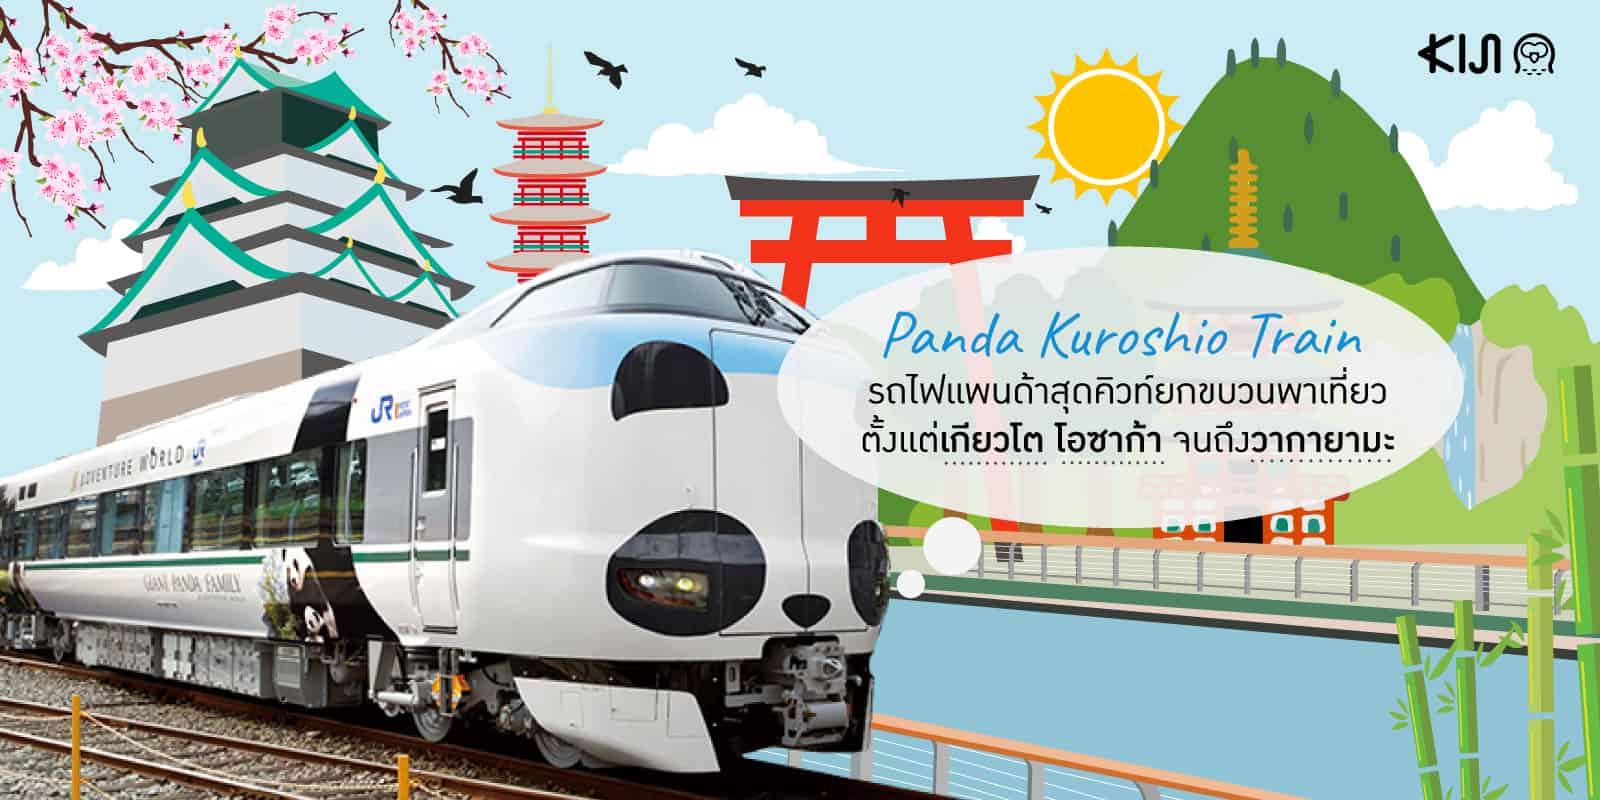 Panda Kuroshio Train รถไฟแพนด้าในเส้นทางเกียวโต โอซาก้า และวากายามะ เริ่ม 14 มี.ค. นี้